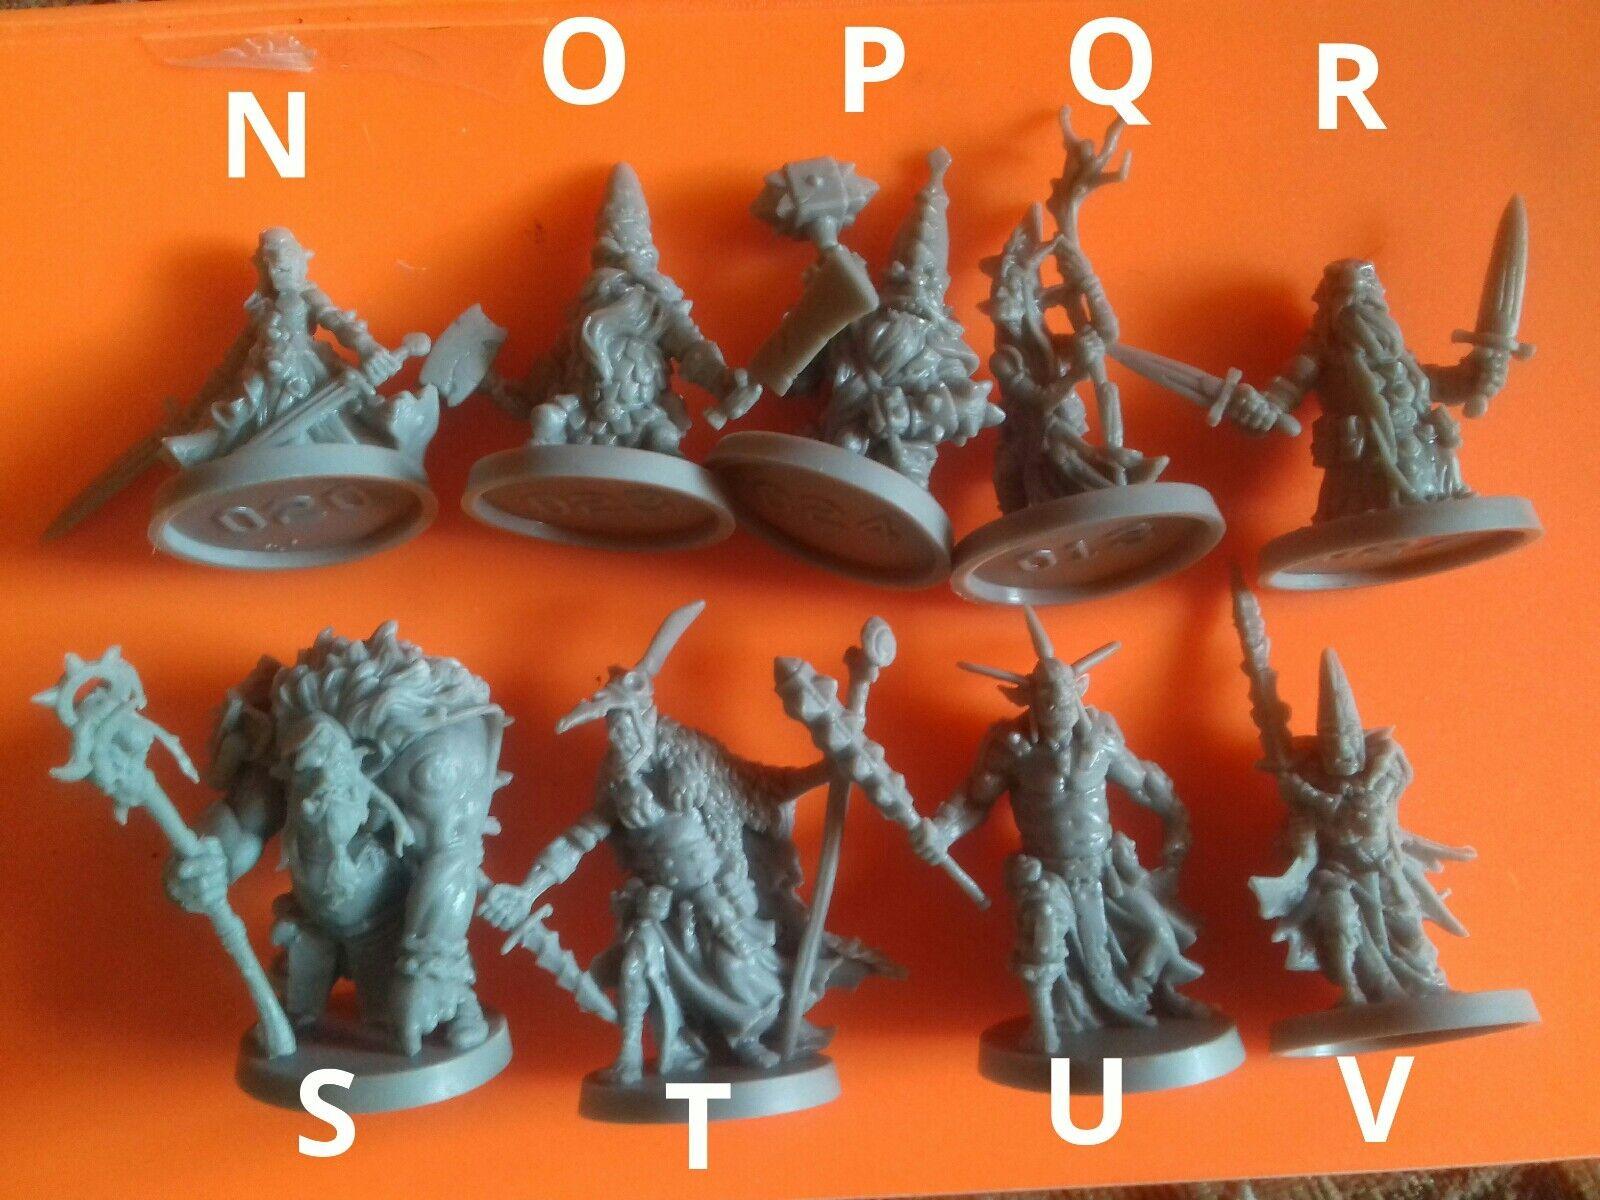 21x Goblin dwarf etc mix minions warriors massive darkness boardgame spare part